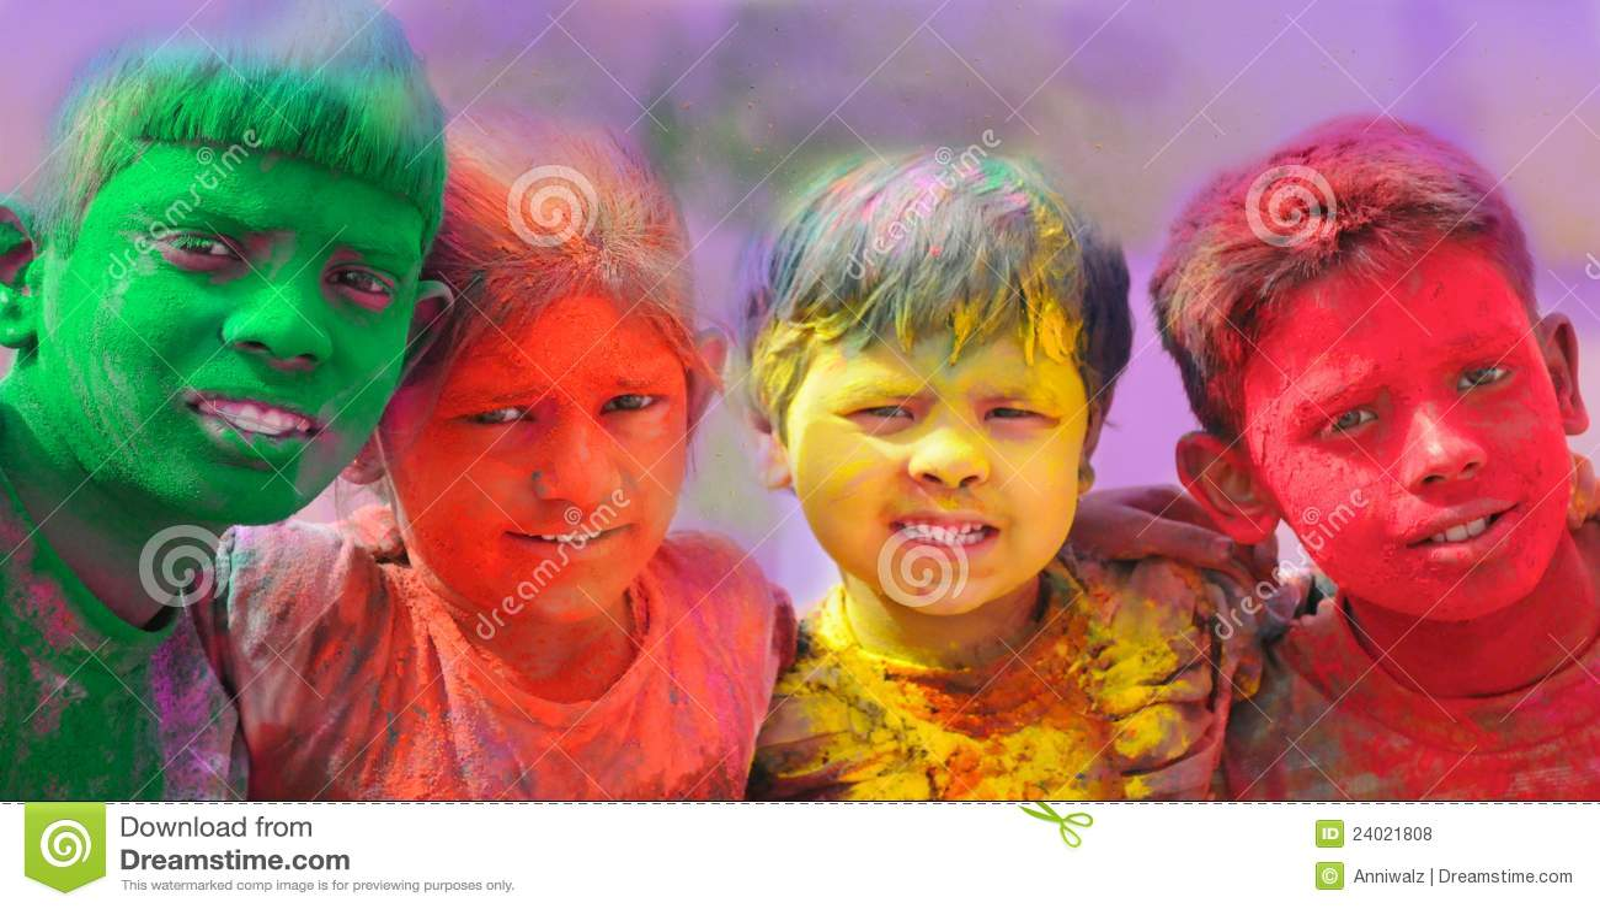 Célébrations de Holi en Inde.